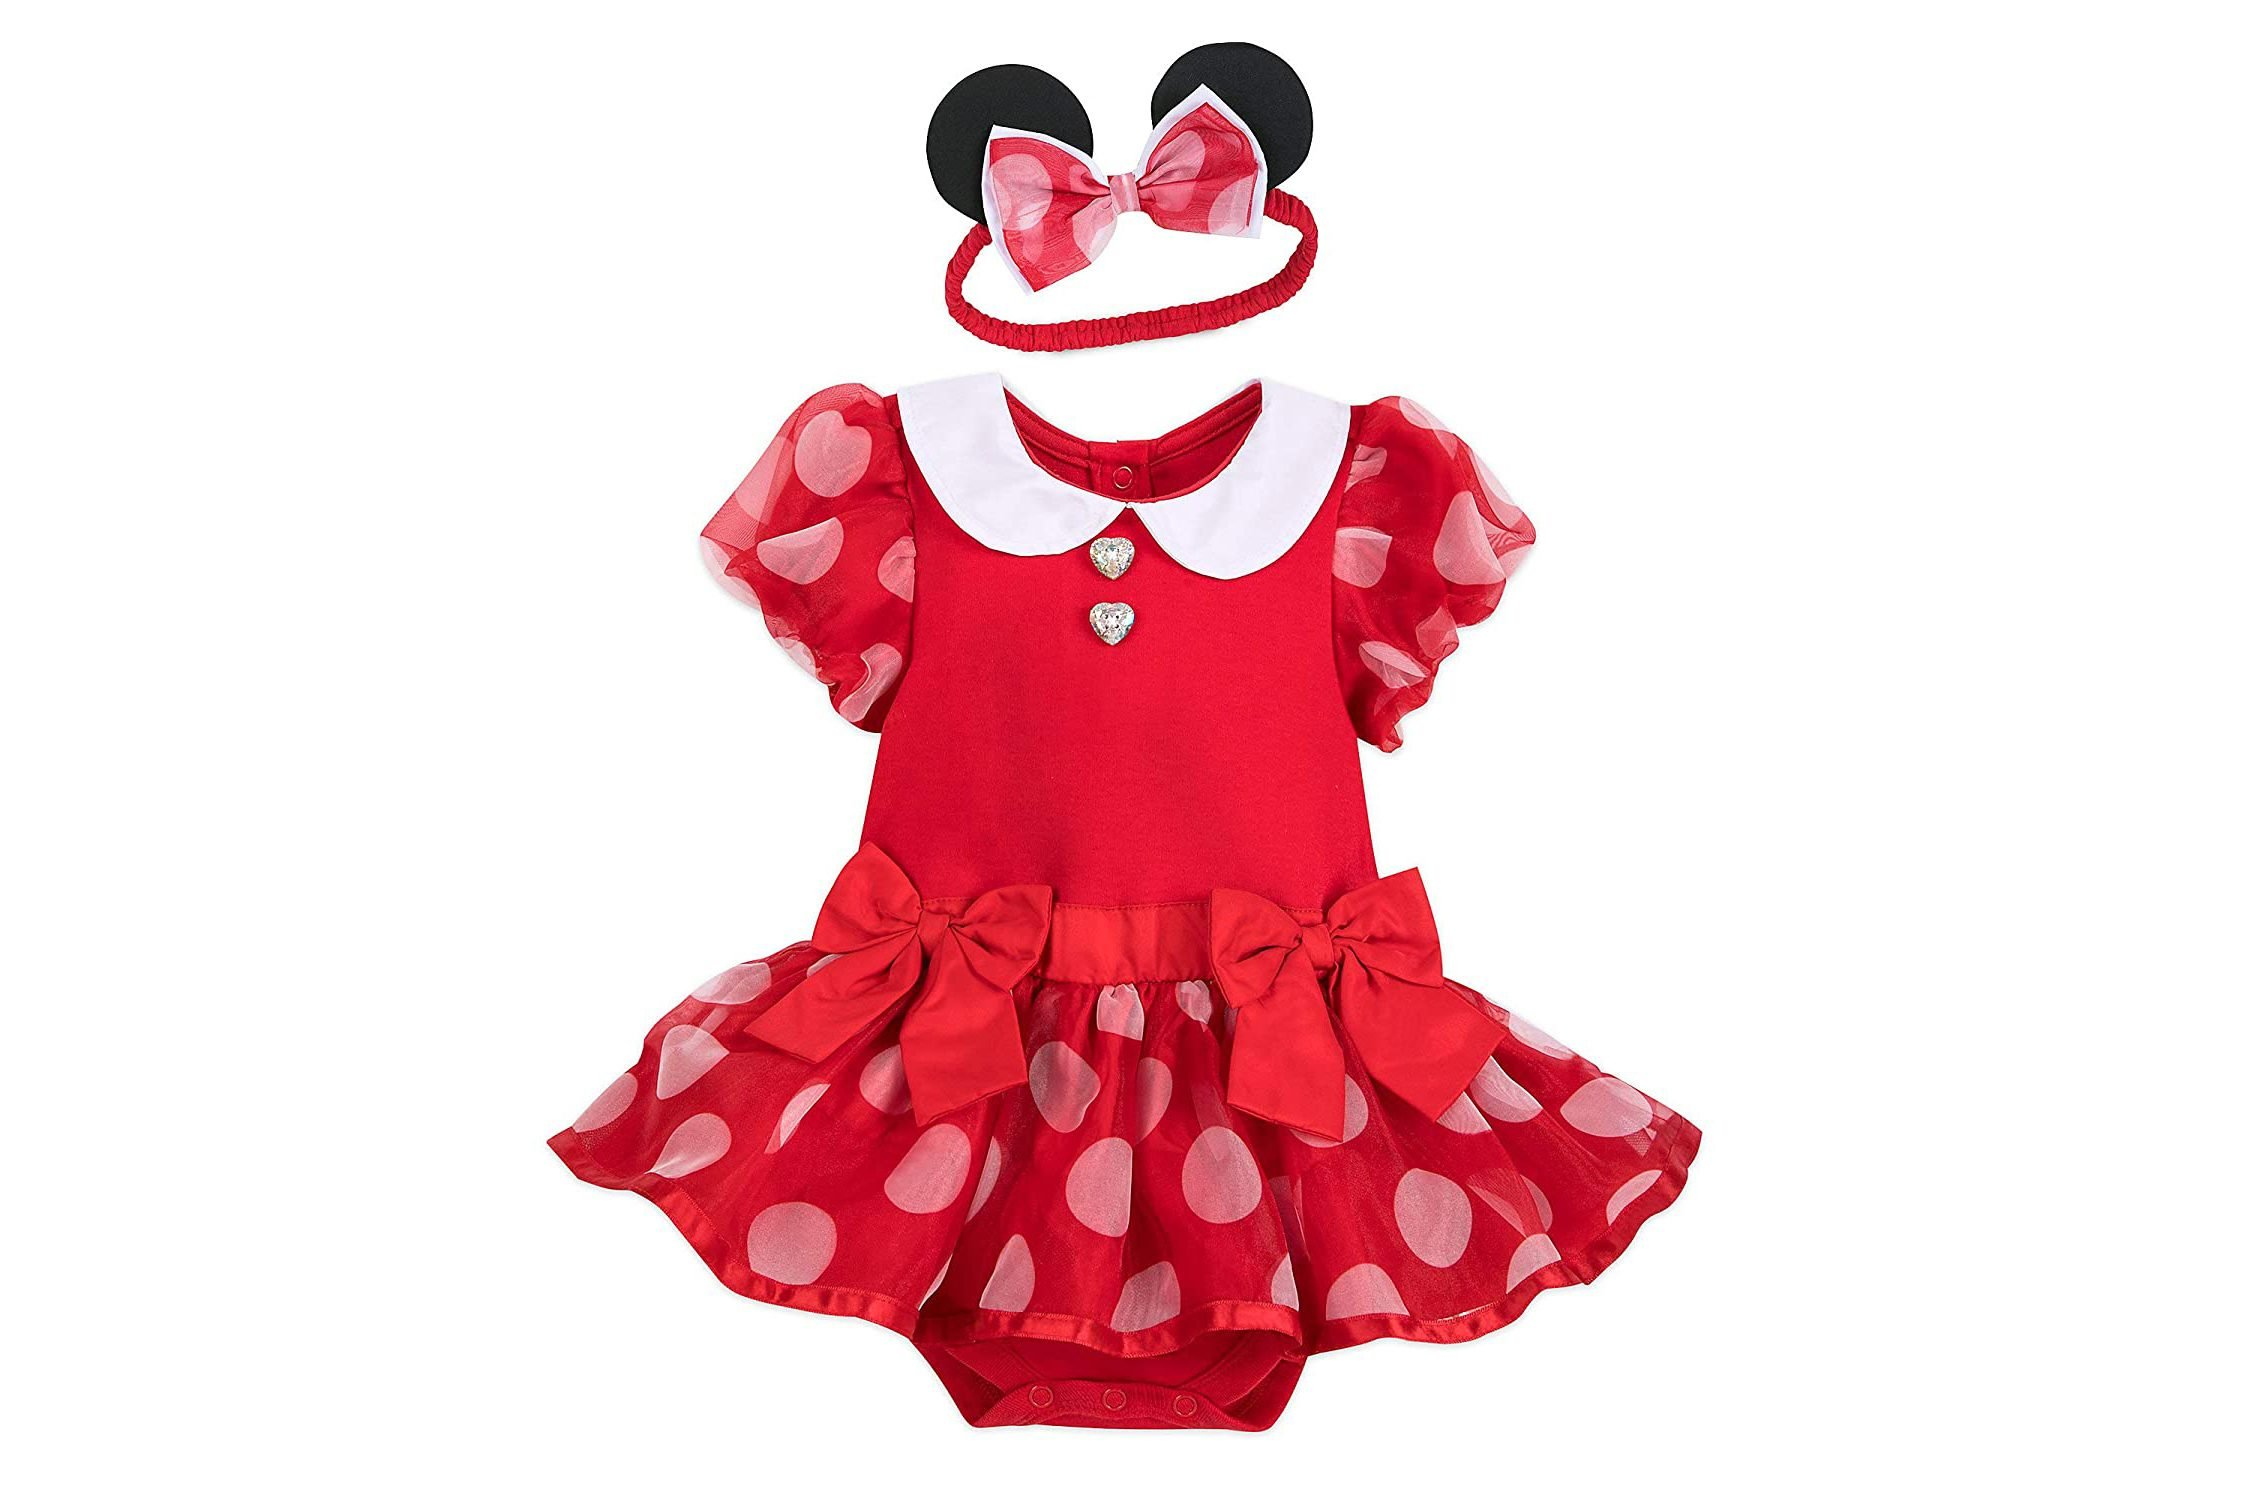 Disney Baby Bodysuits